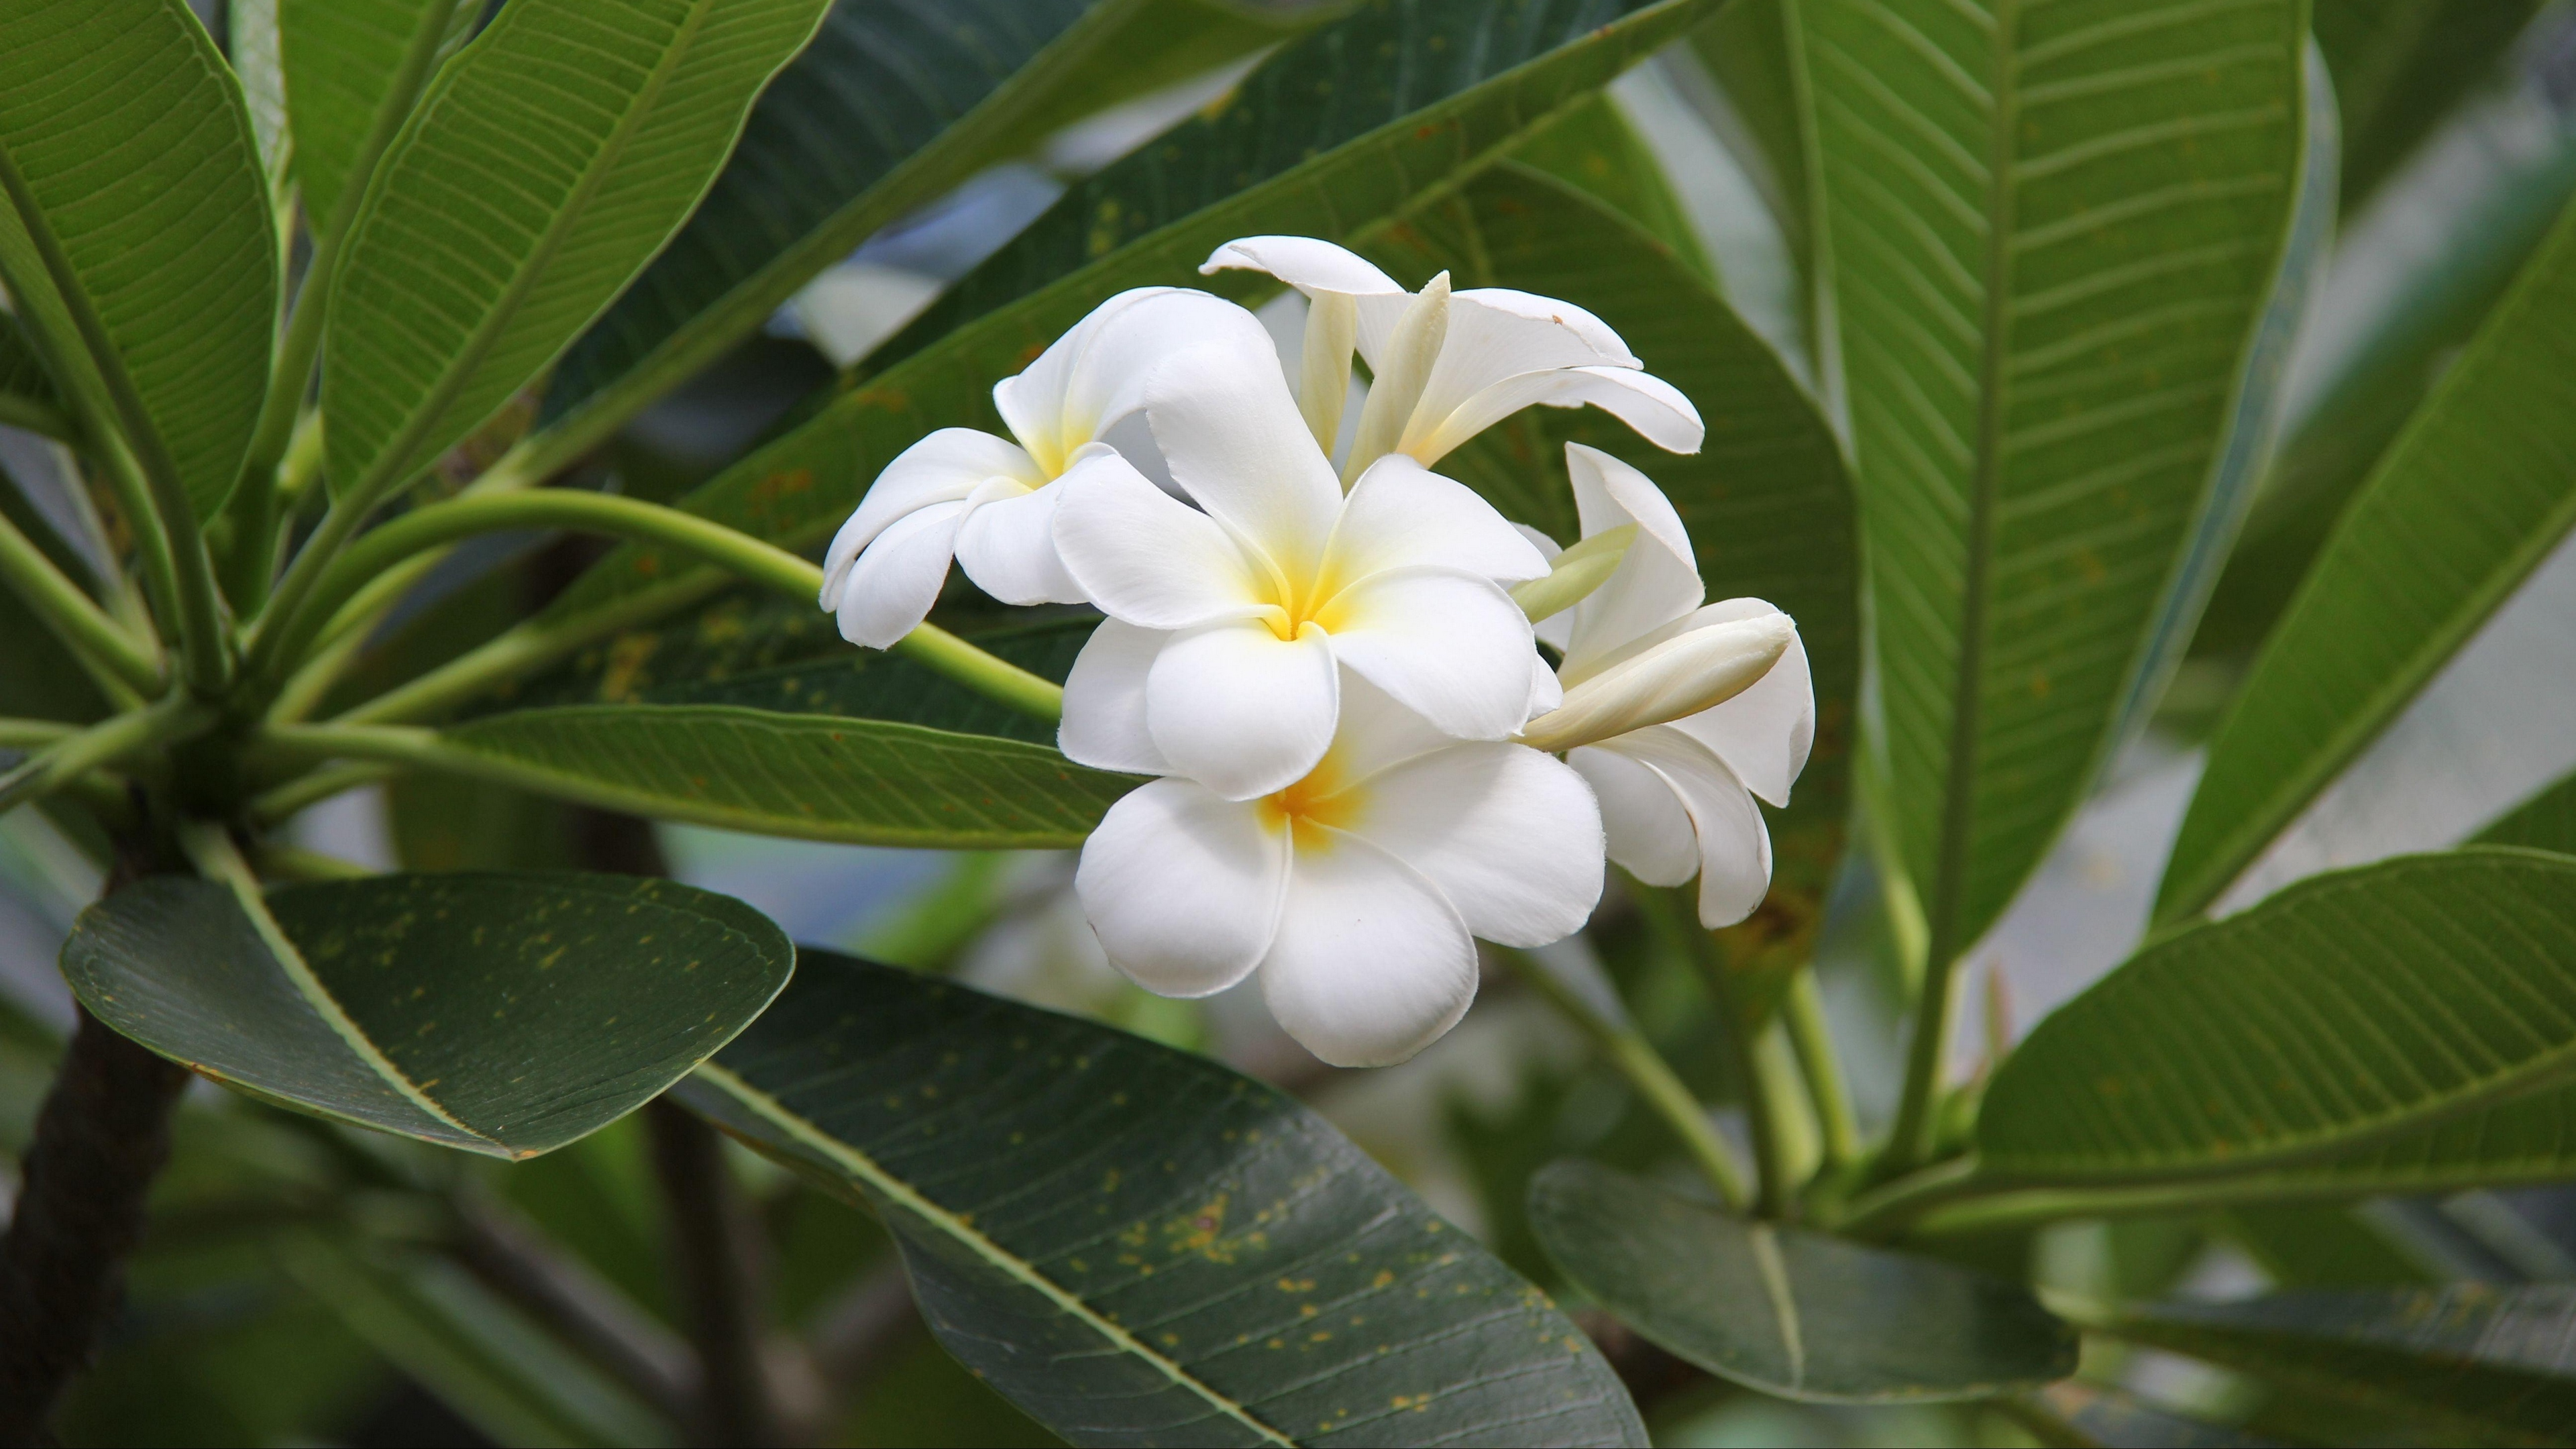 plumeria bloom snowy green buds 4k 1540064176 - plumeria, bloom, snowy, green, buds 4k - Snowy, plumeria, Bloom